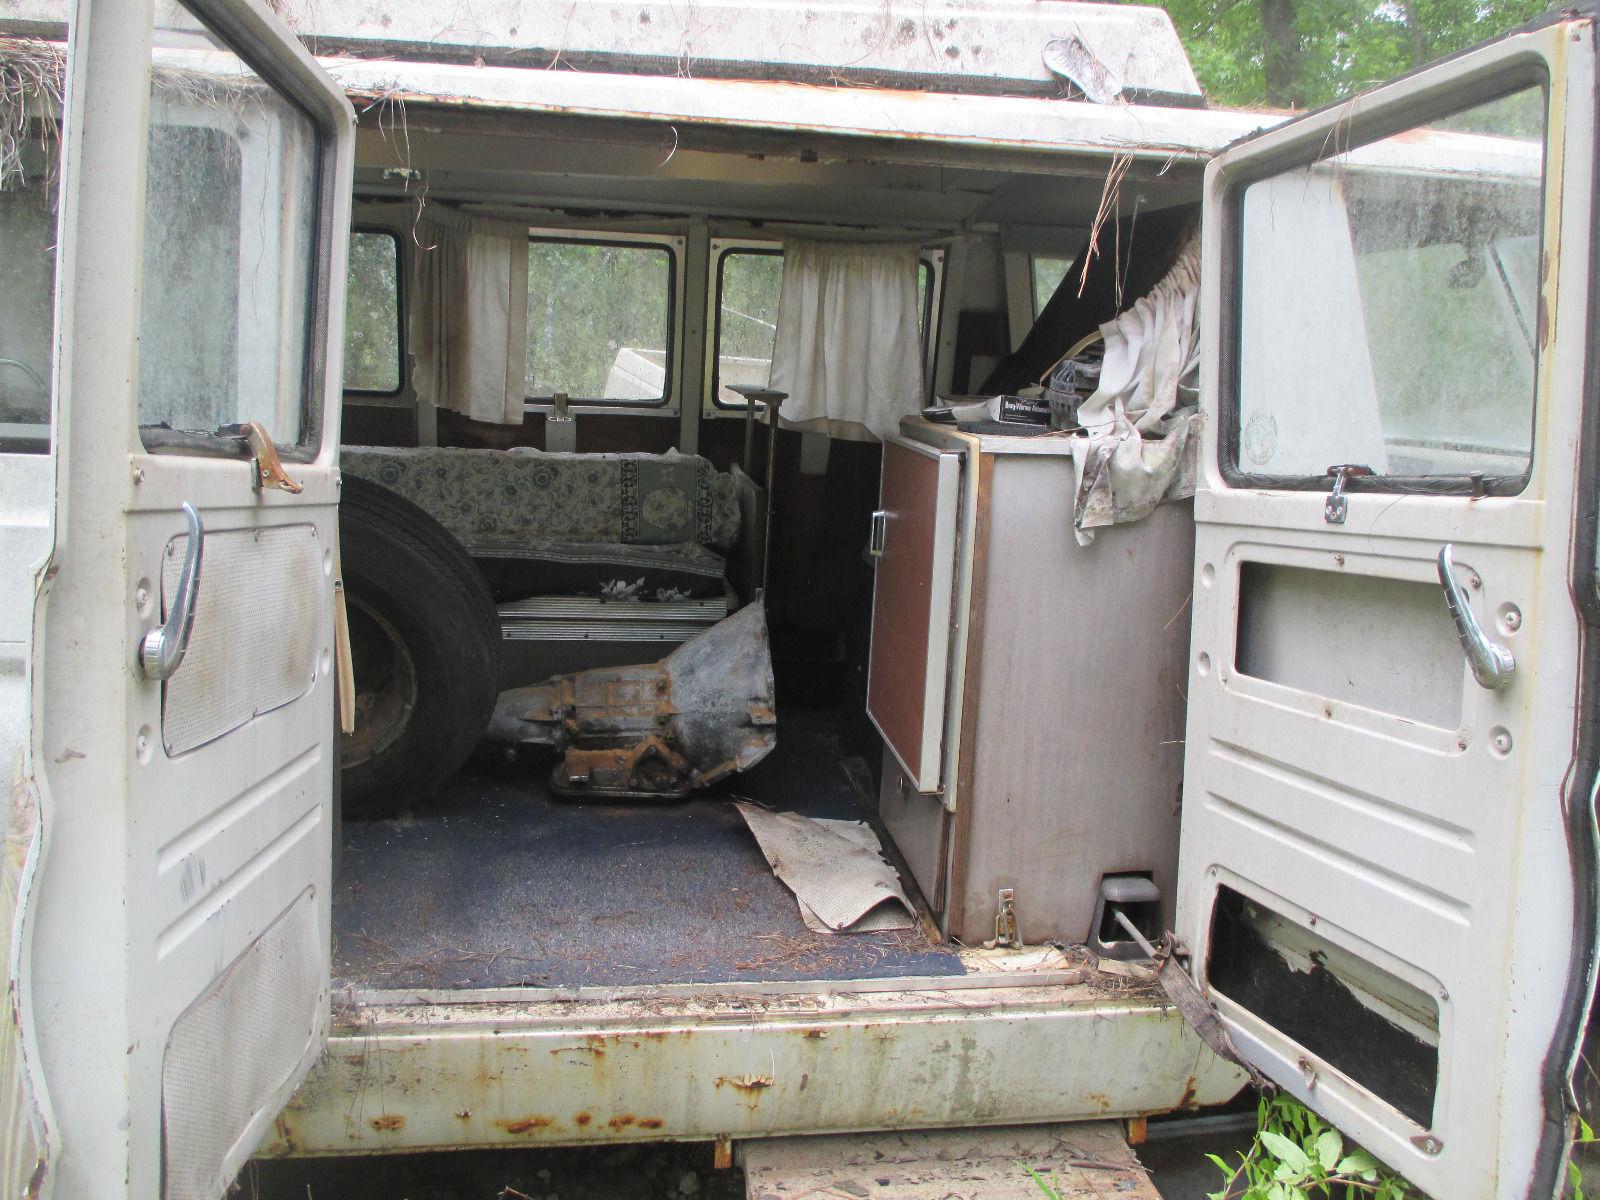 1965 Dodge A100 Sportsman Camper Parts Car For Sale in ...